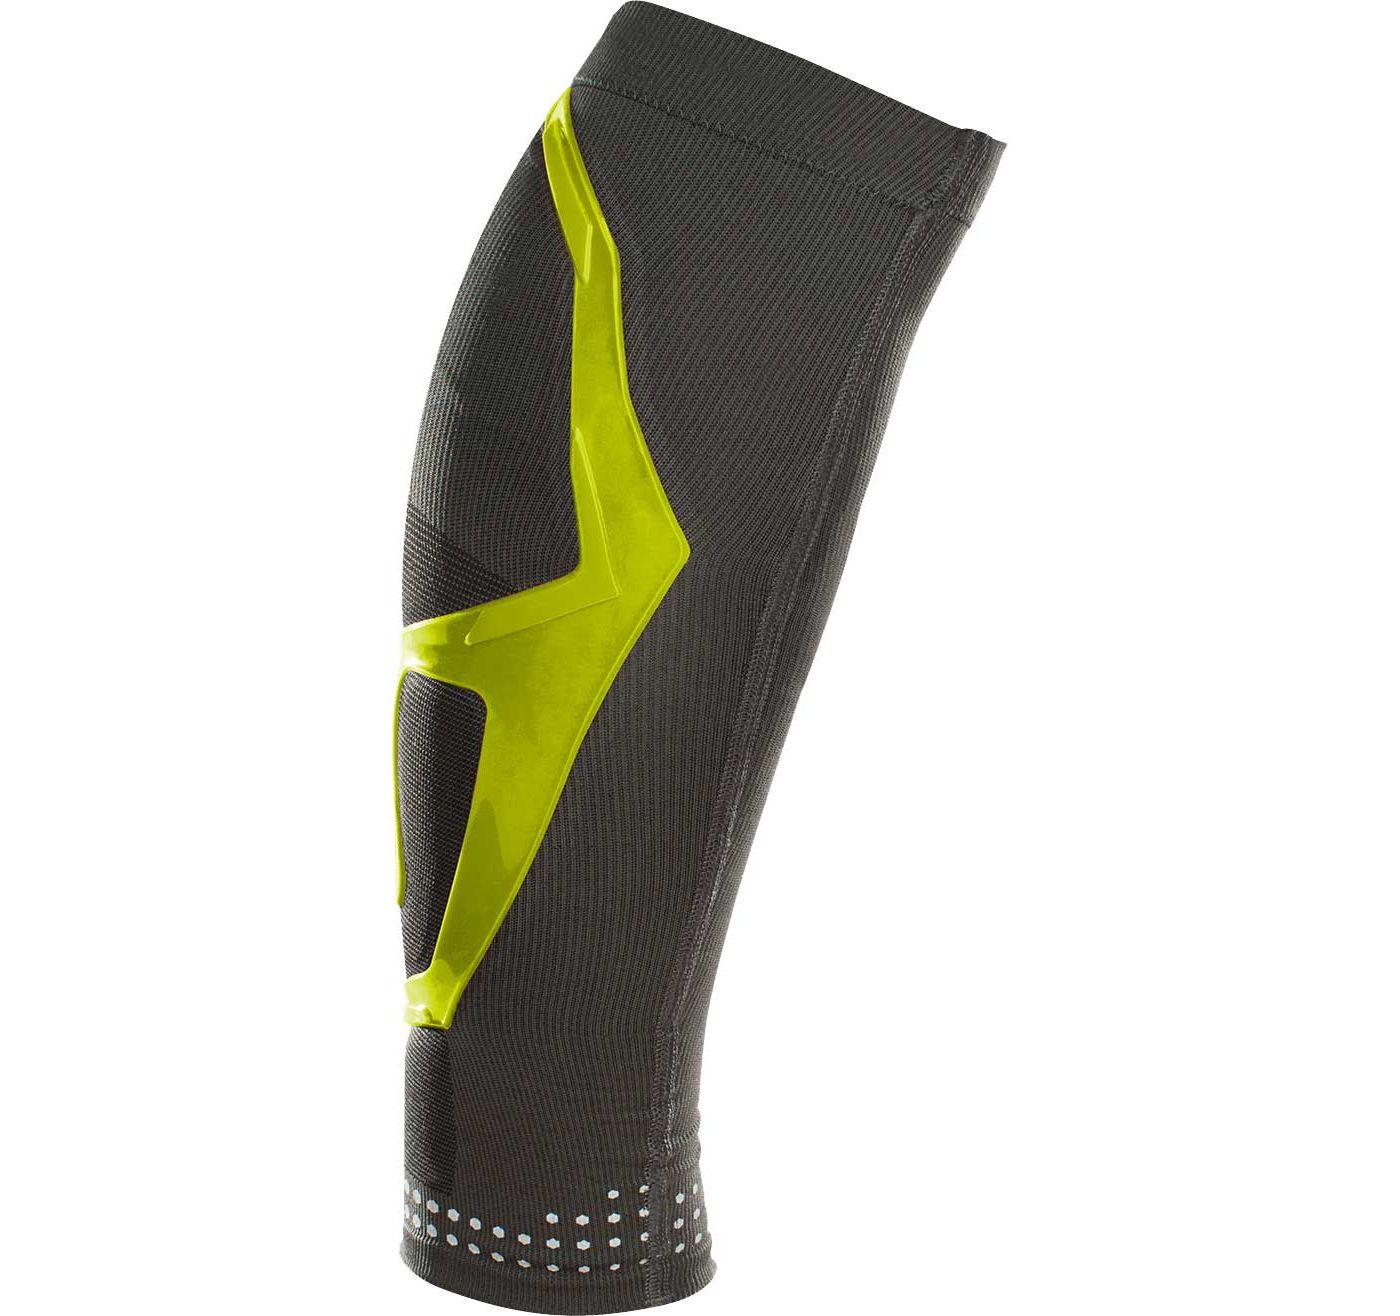 DonJoy Performance TriZone Calf Sleeve